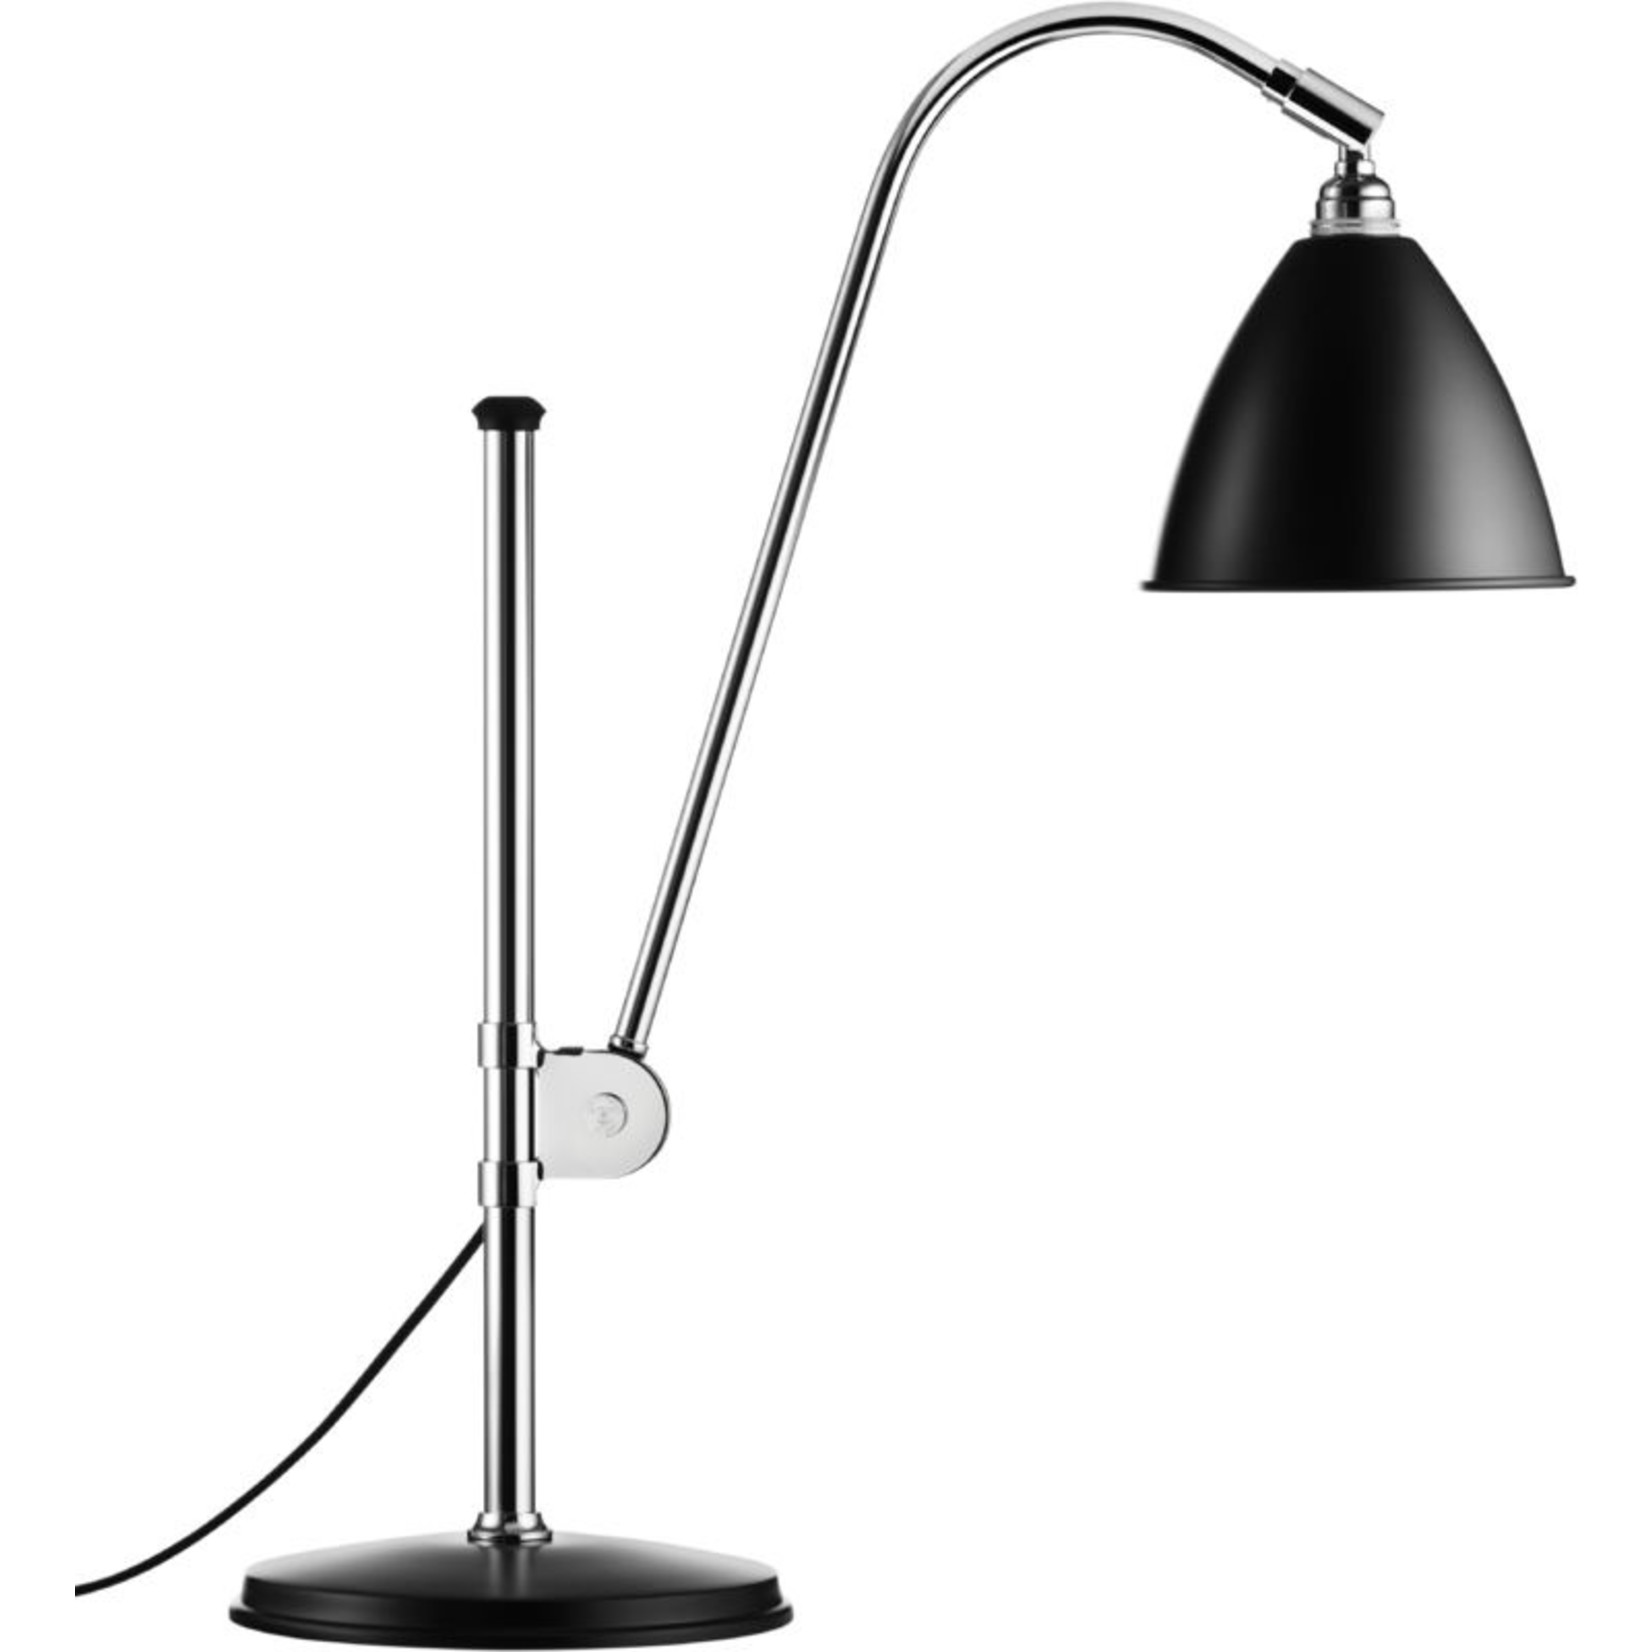 Gubi BL1 Table Lamp - Ø16 | Chrome Base & Black Semi Matt Shade